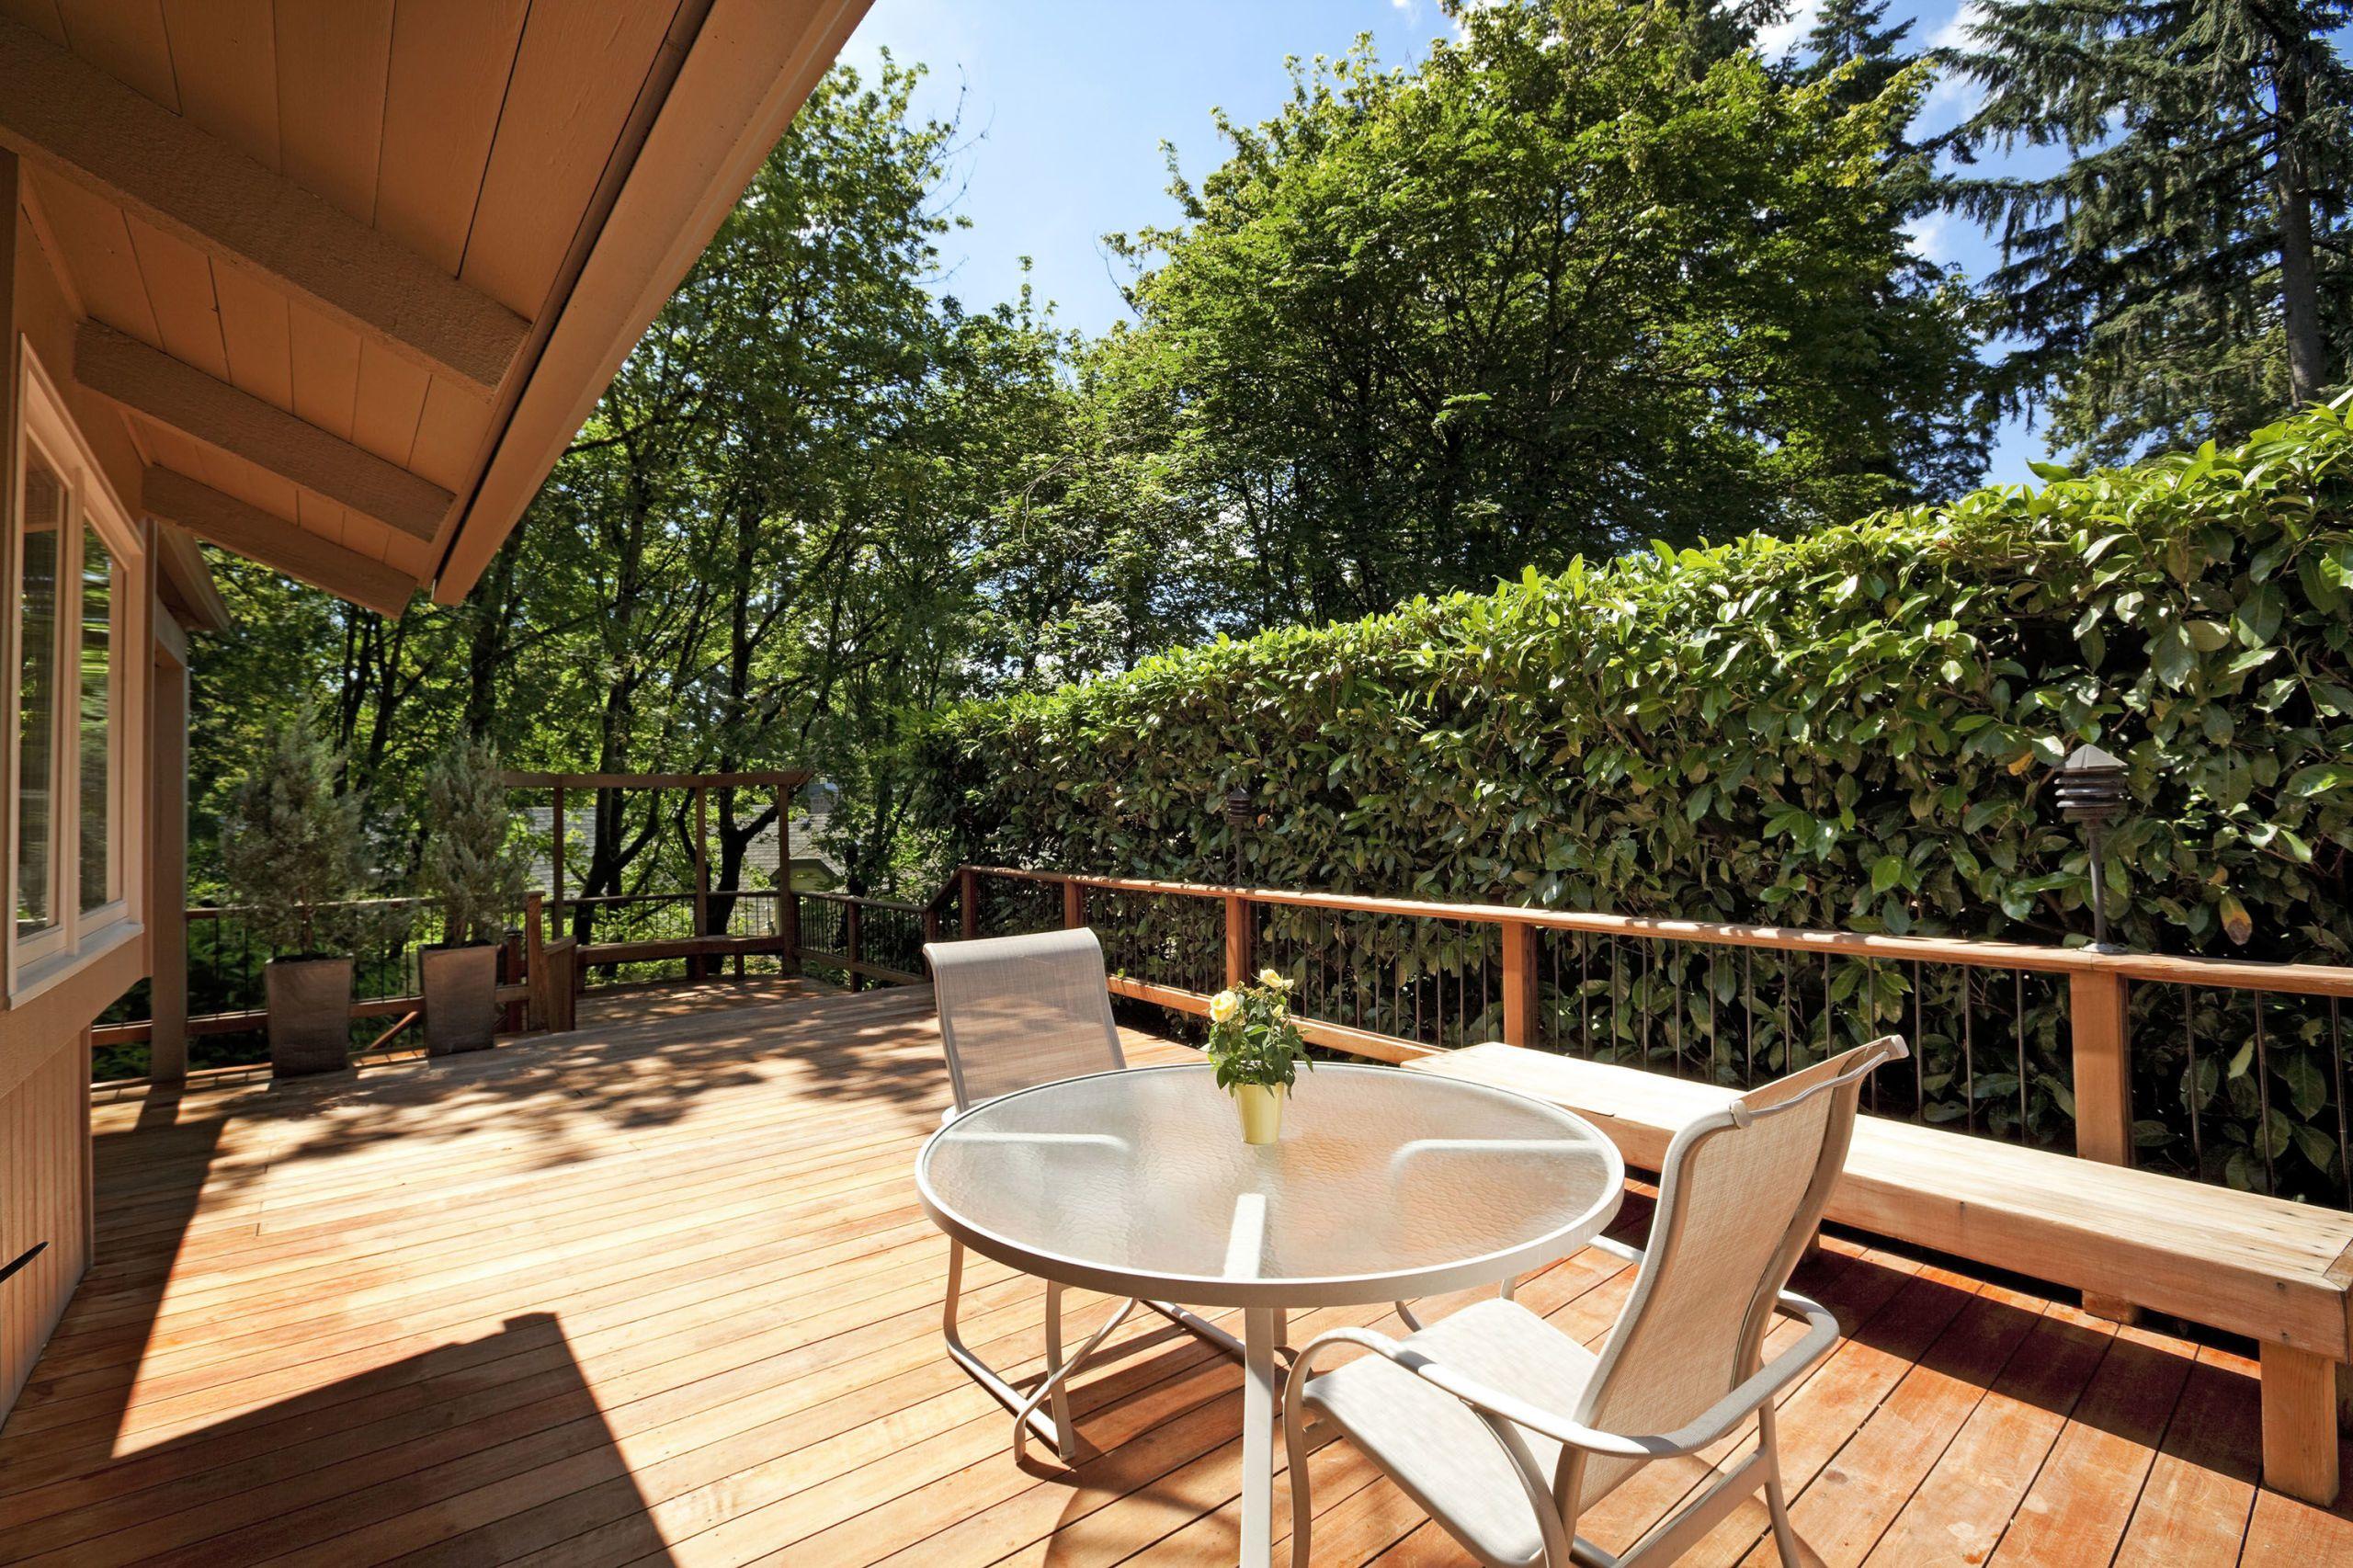 Diy Deck Building Construction Details : How to build a deck in your backyard easy deck building plans